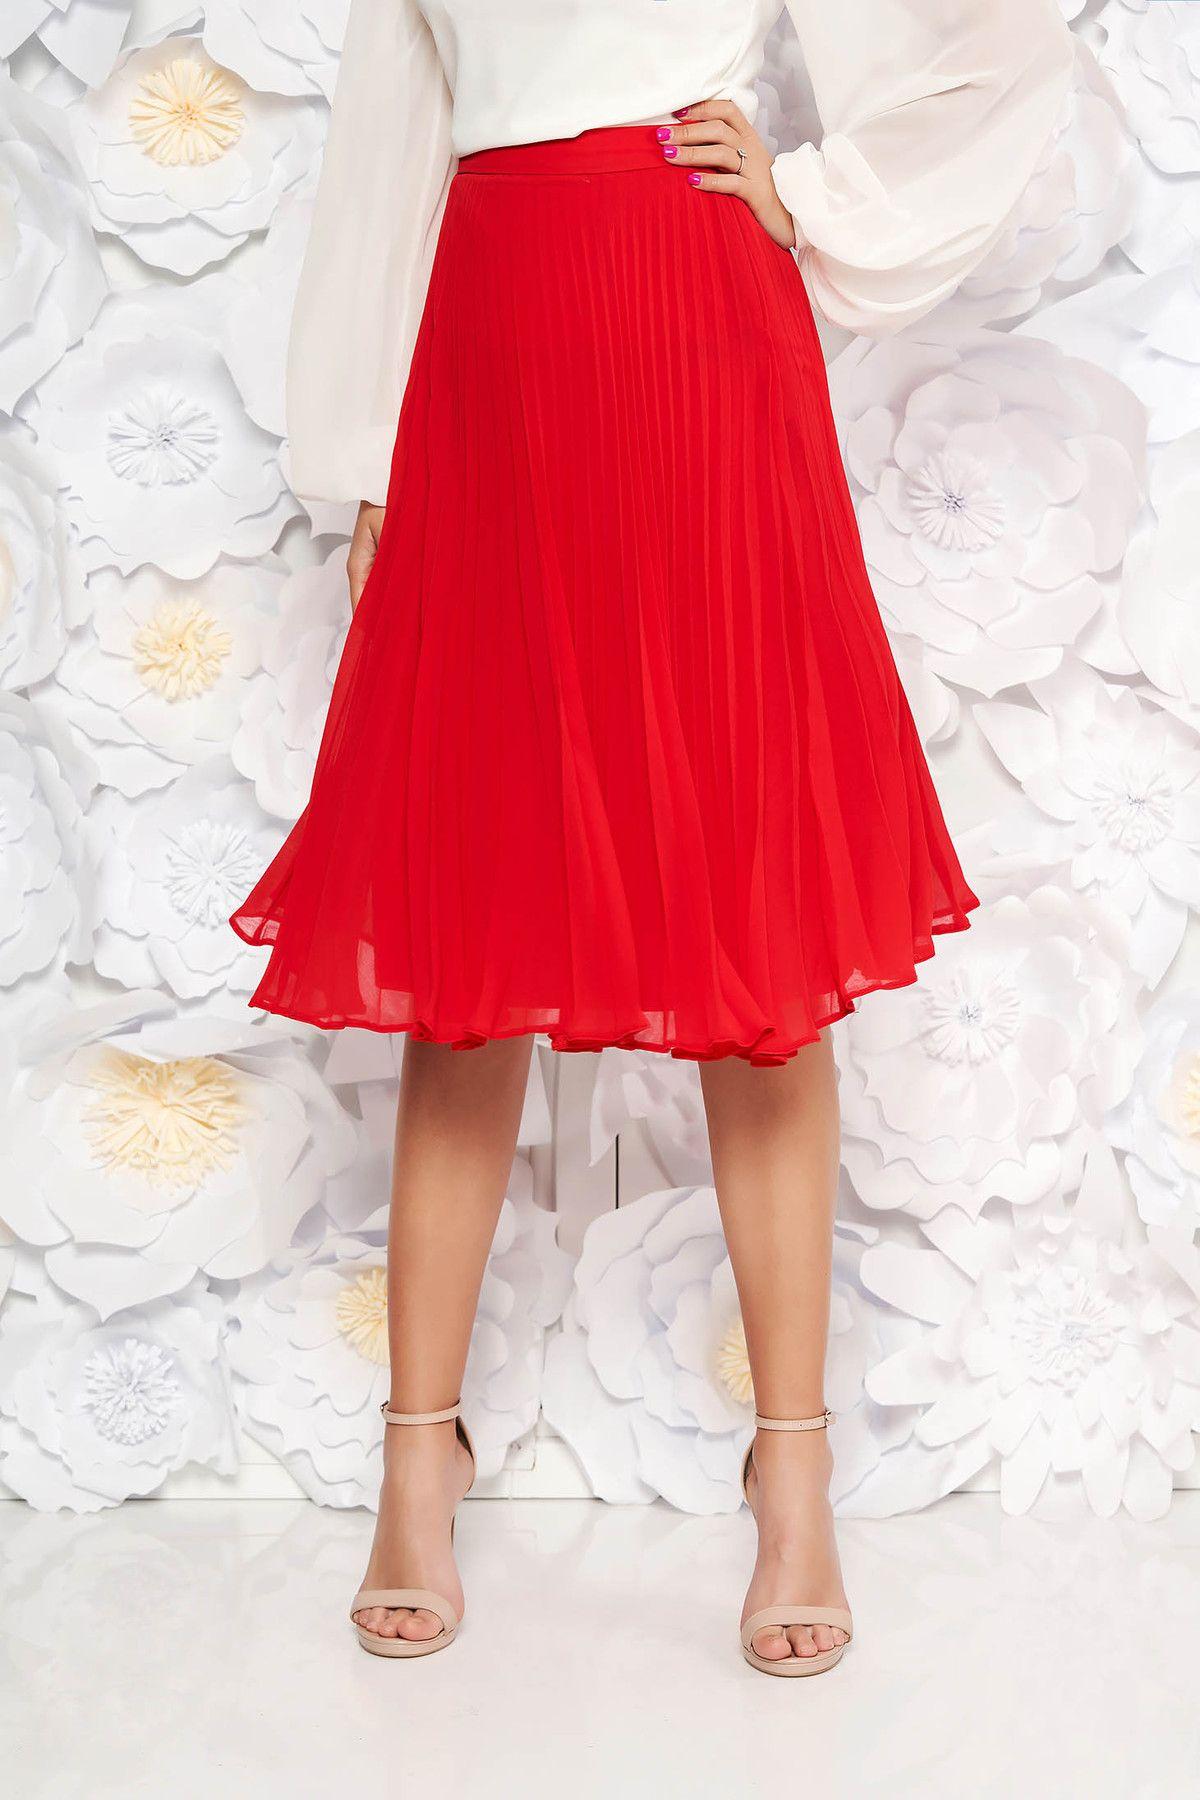 ajunge ieftin nou ridicat noi speciale Fusta StarShinerS rosie eleganta plisata in clos din voal cu talie inalta -  http://hainesic.ro/fuste/fusta-starshiners-rosie-… | Skirts, Elegant, High  waisted skirt